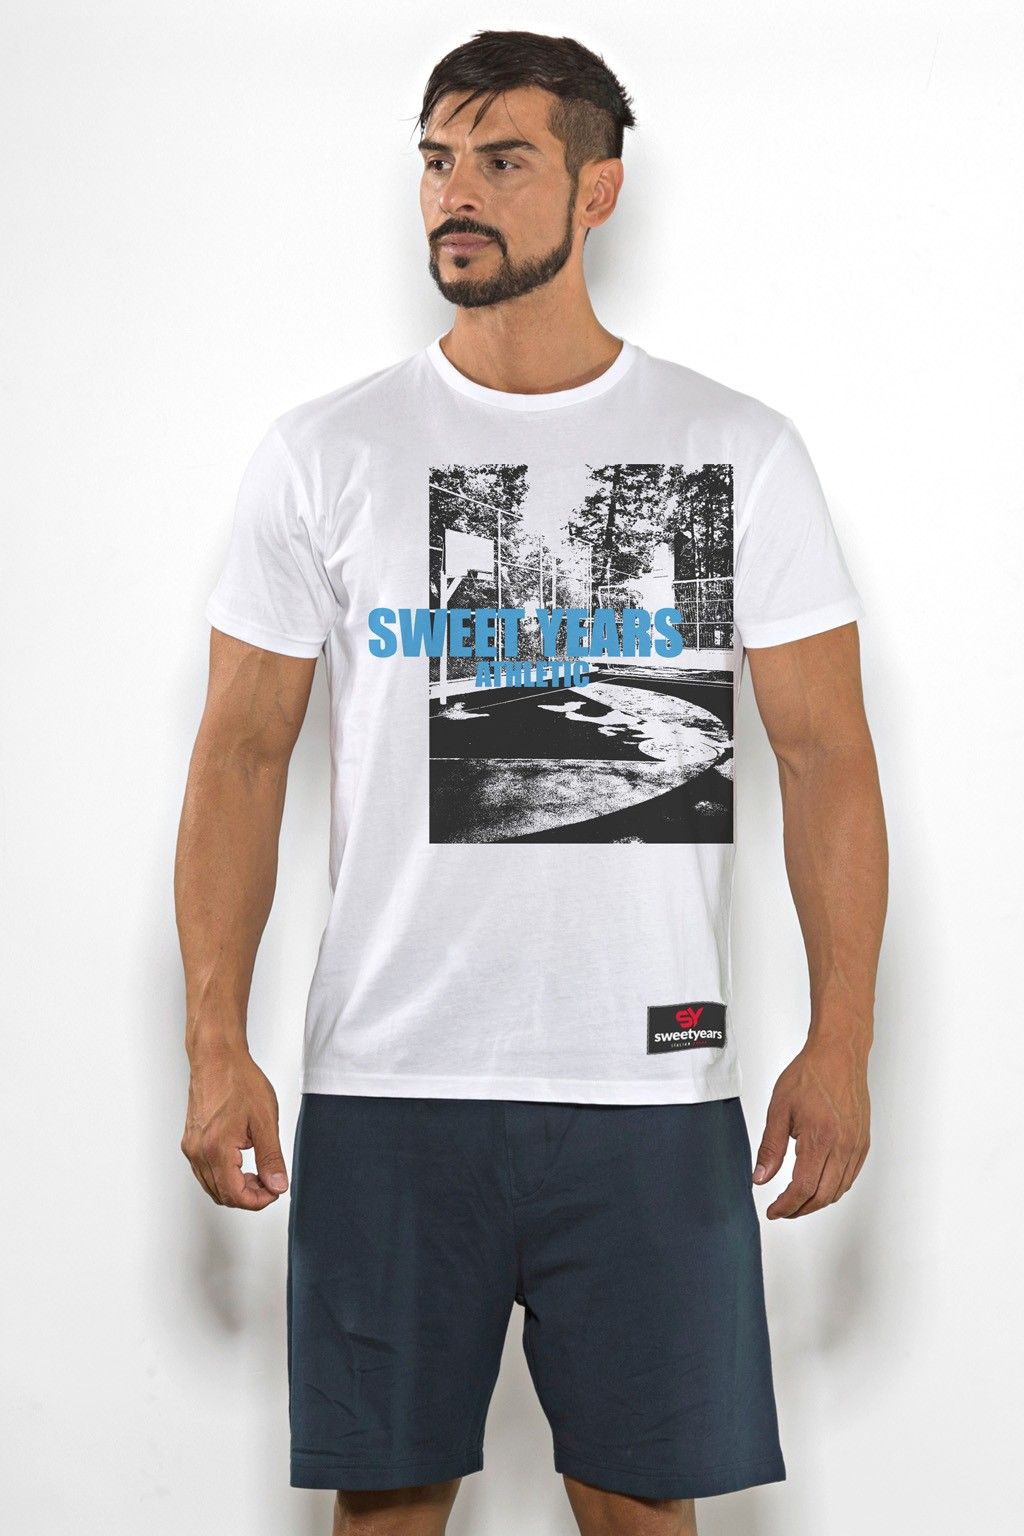 T-shirt uomo Sweet Years cotone tinta unita con stampa playground sul petto